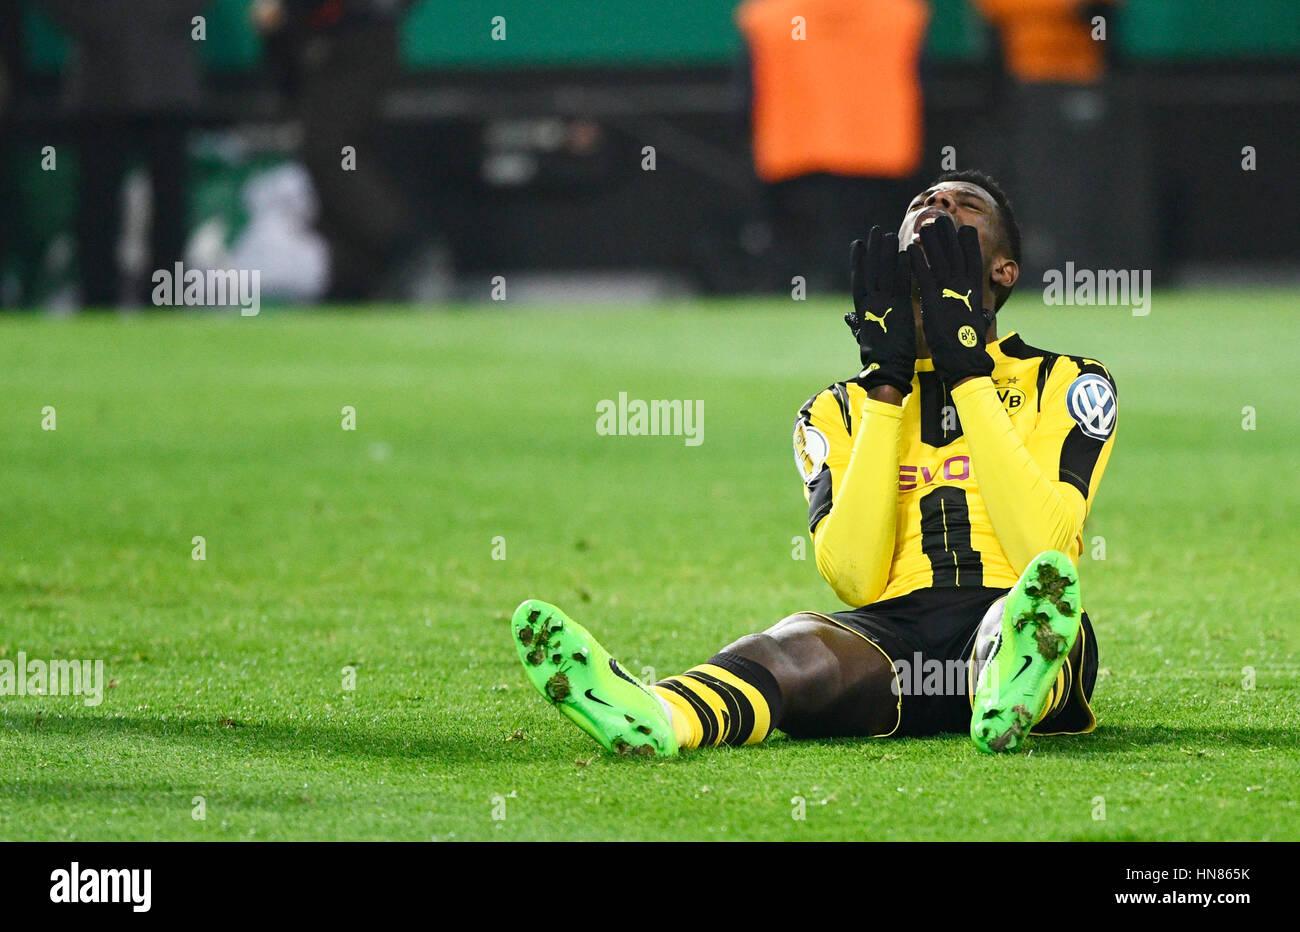 Signal Iduna Park Dortmund, Germany. 8th February, 2017. German football Cup DFB-Pokal 2016/17 Round of sixteen, - Stock Image